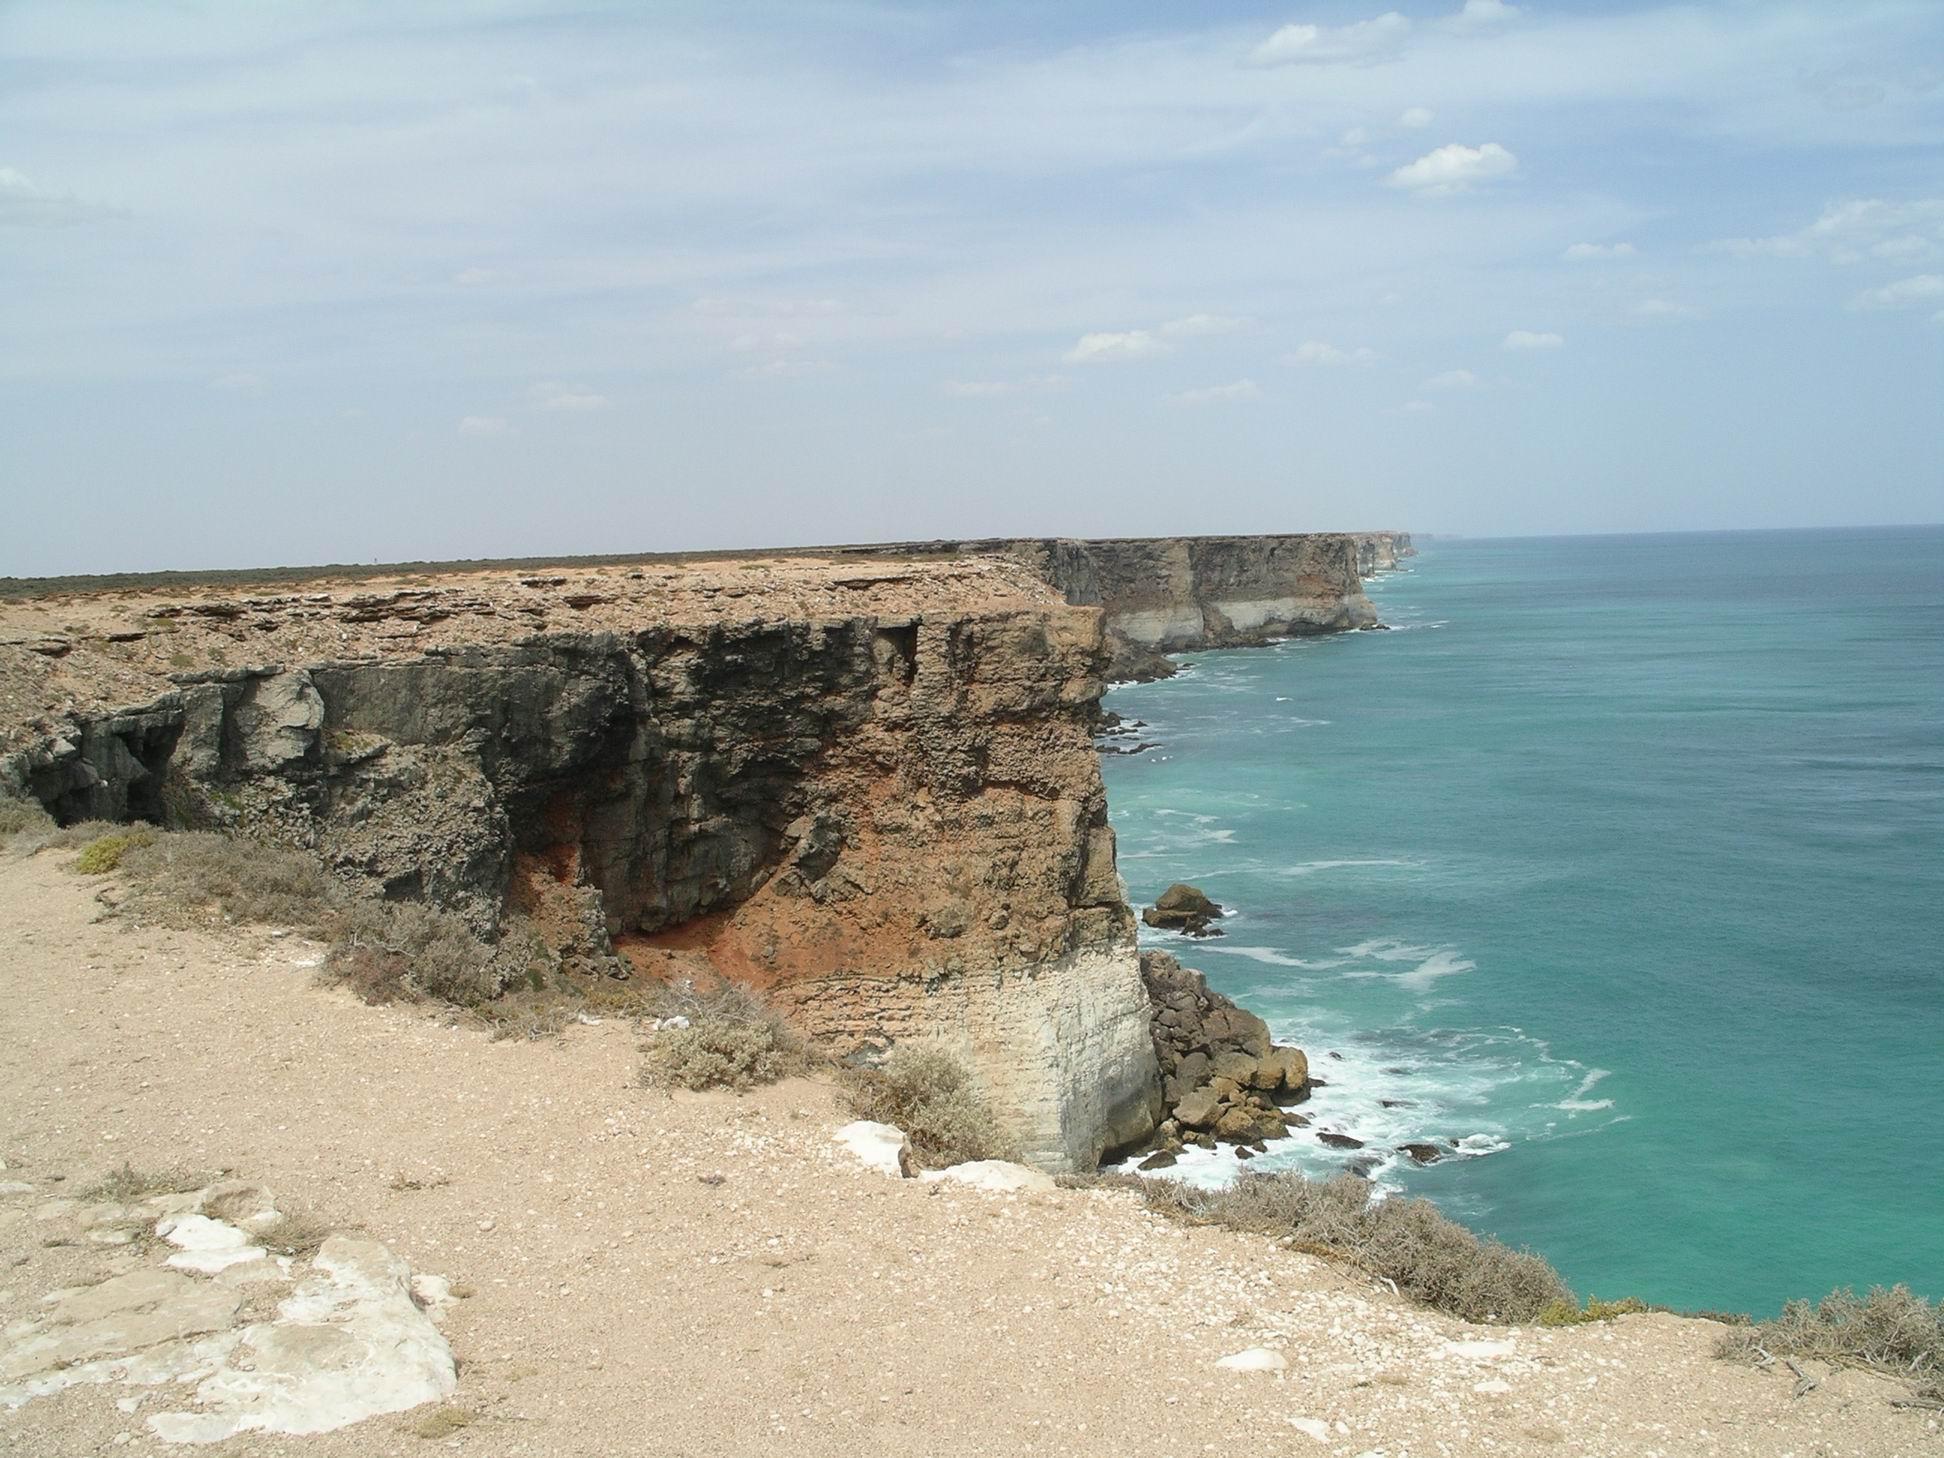 Resize of 12-08-2006 nullarbor cliffs 5